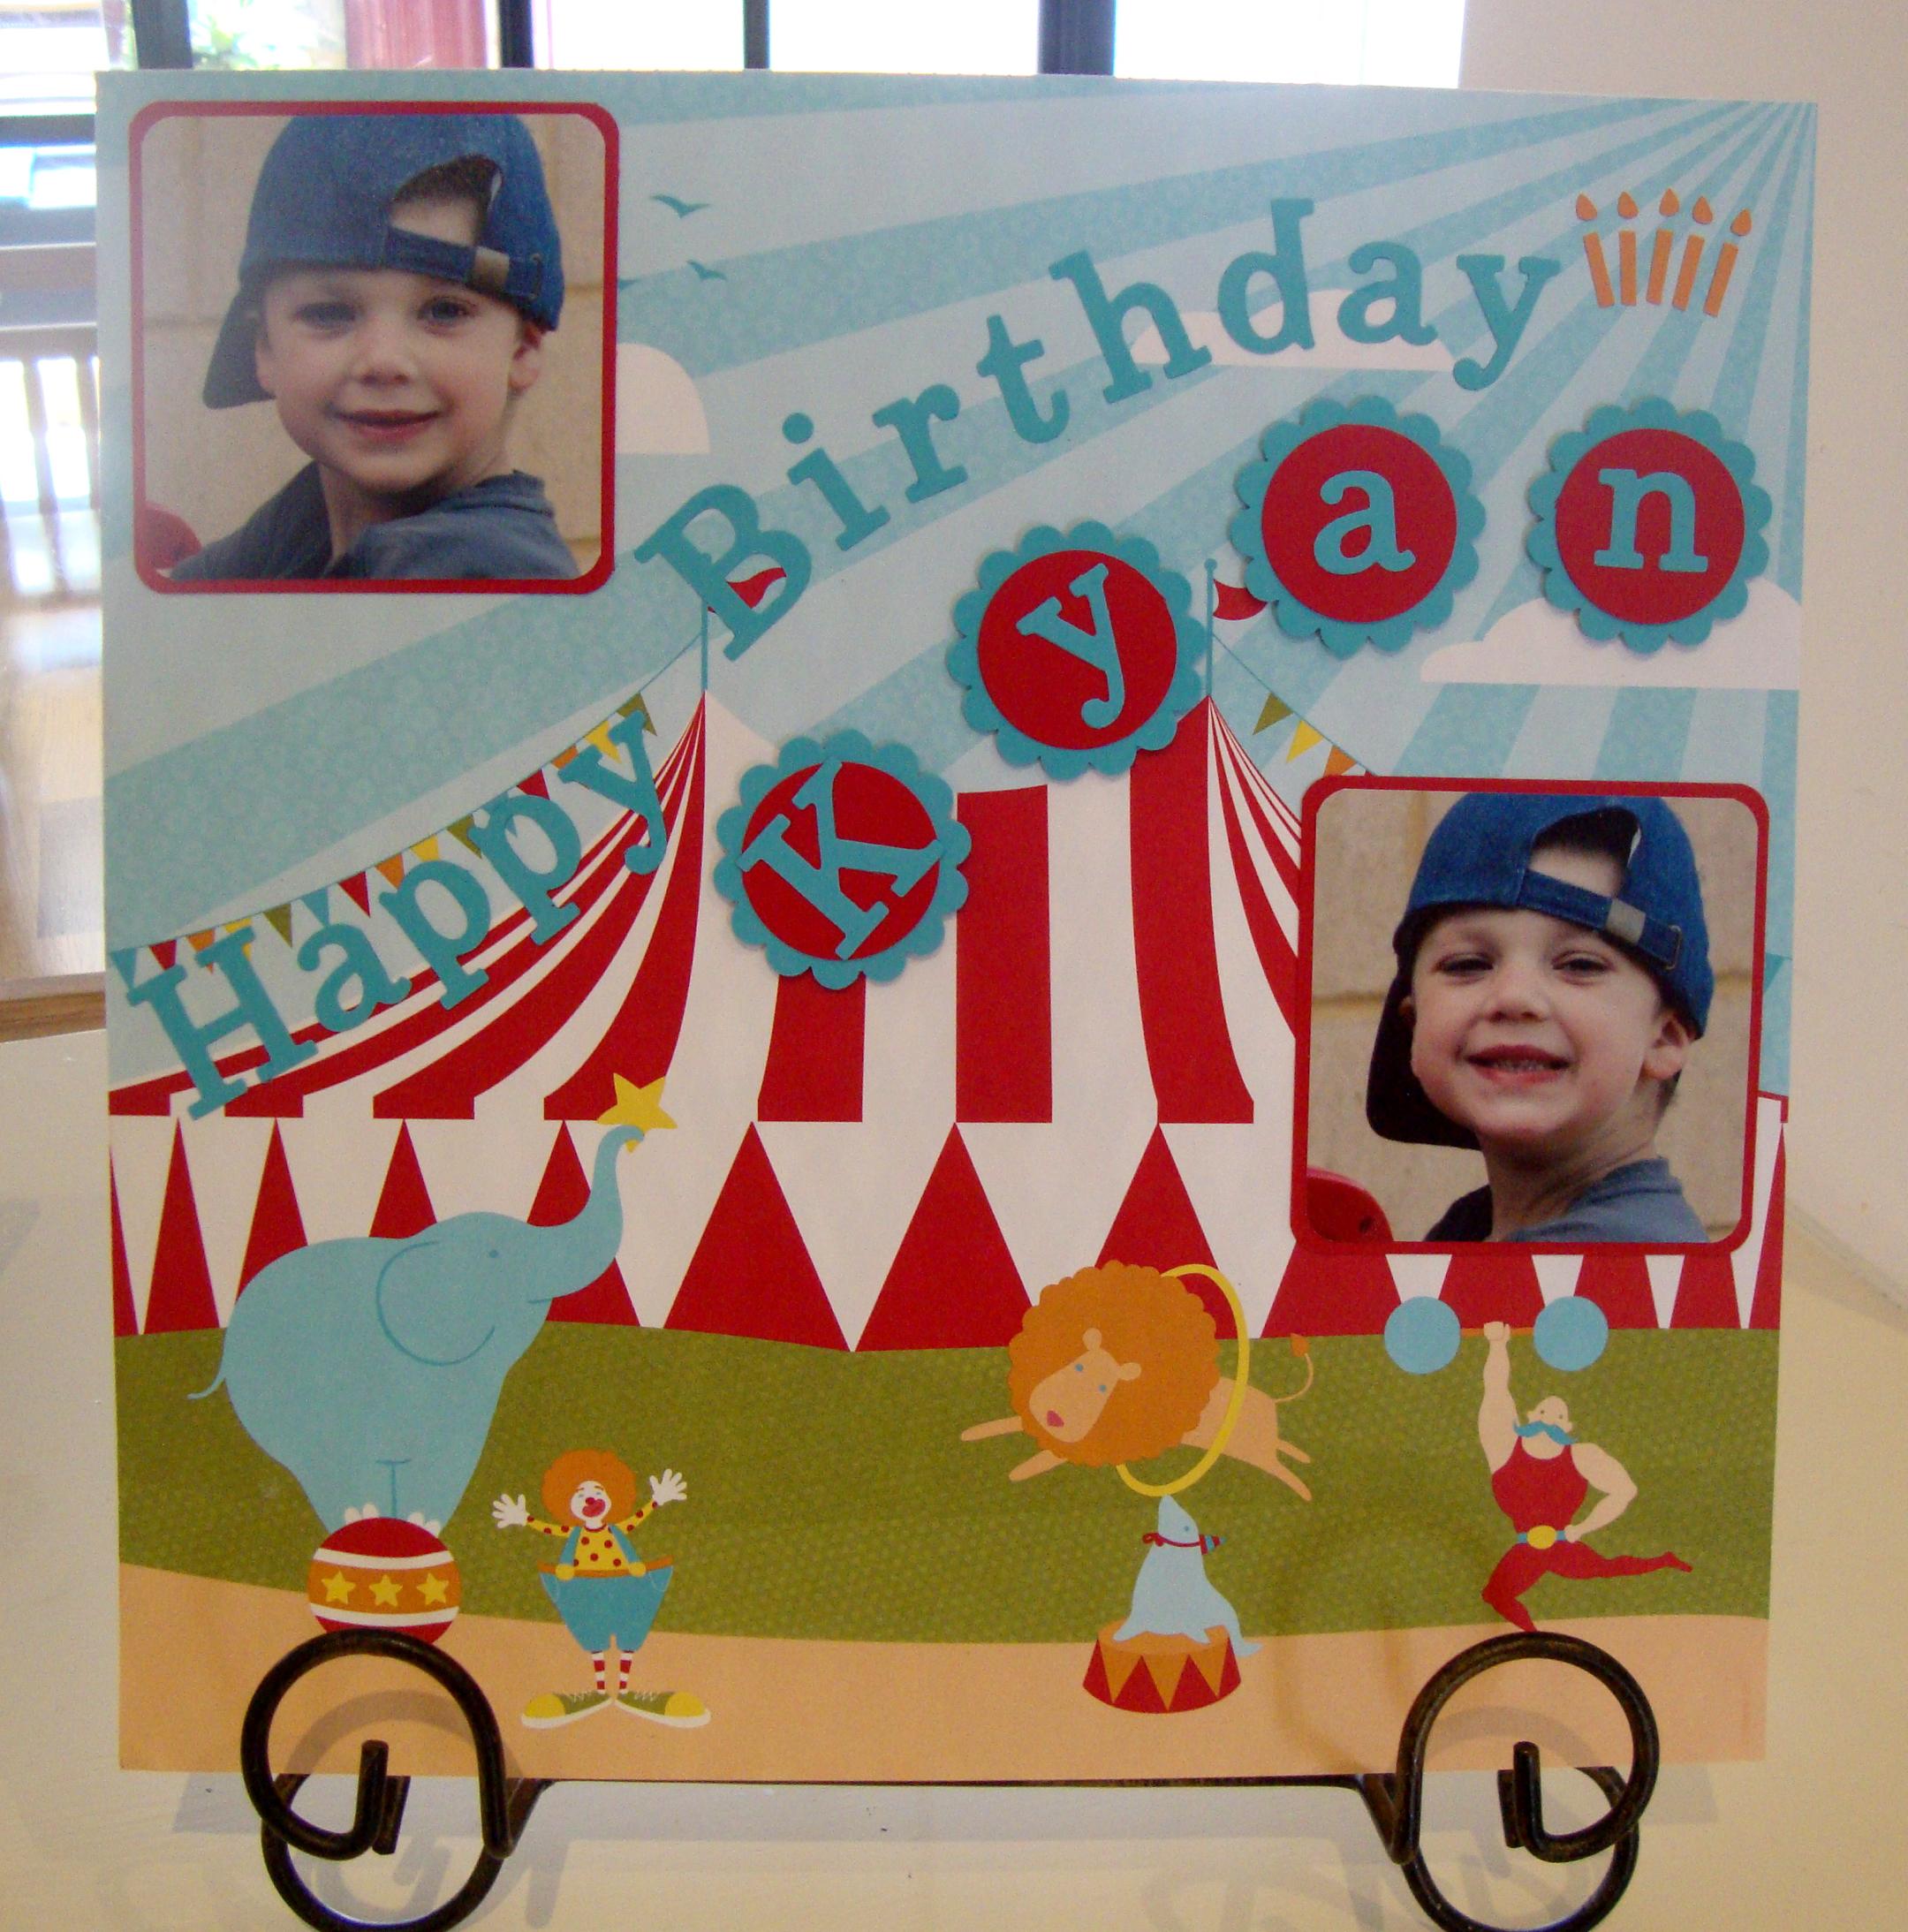 Scrapbook ideas for birthday - Scrapbook Ideas For Birthday 84